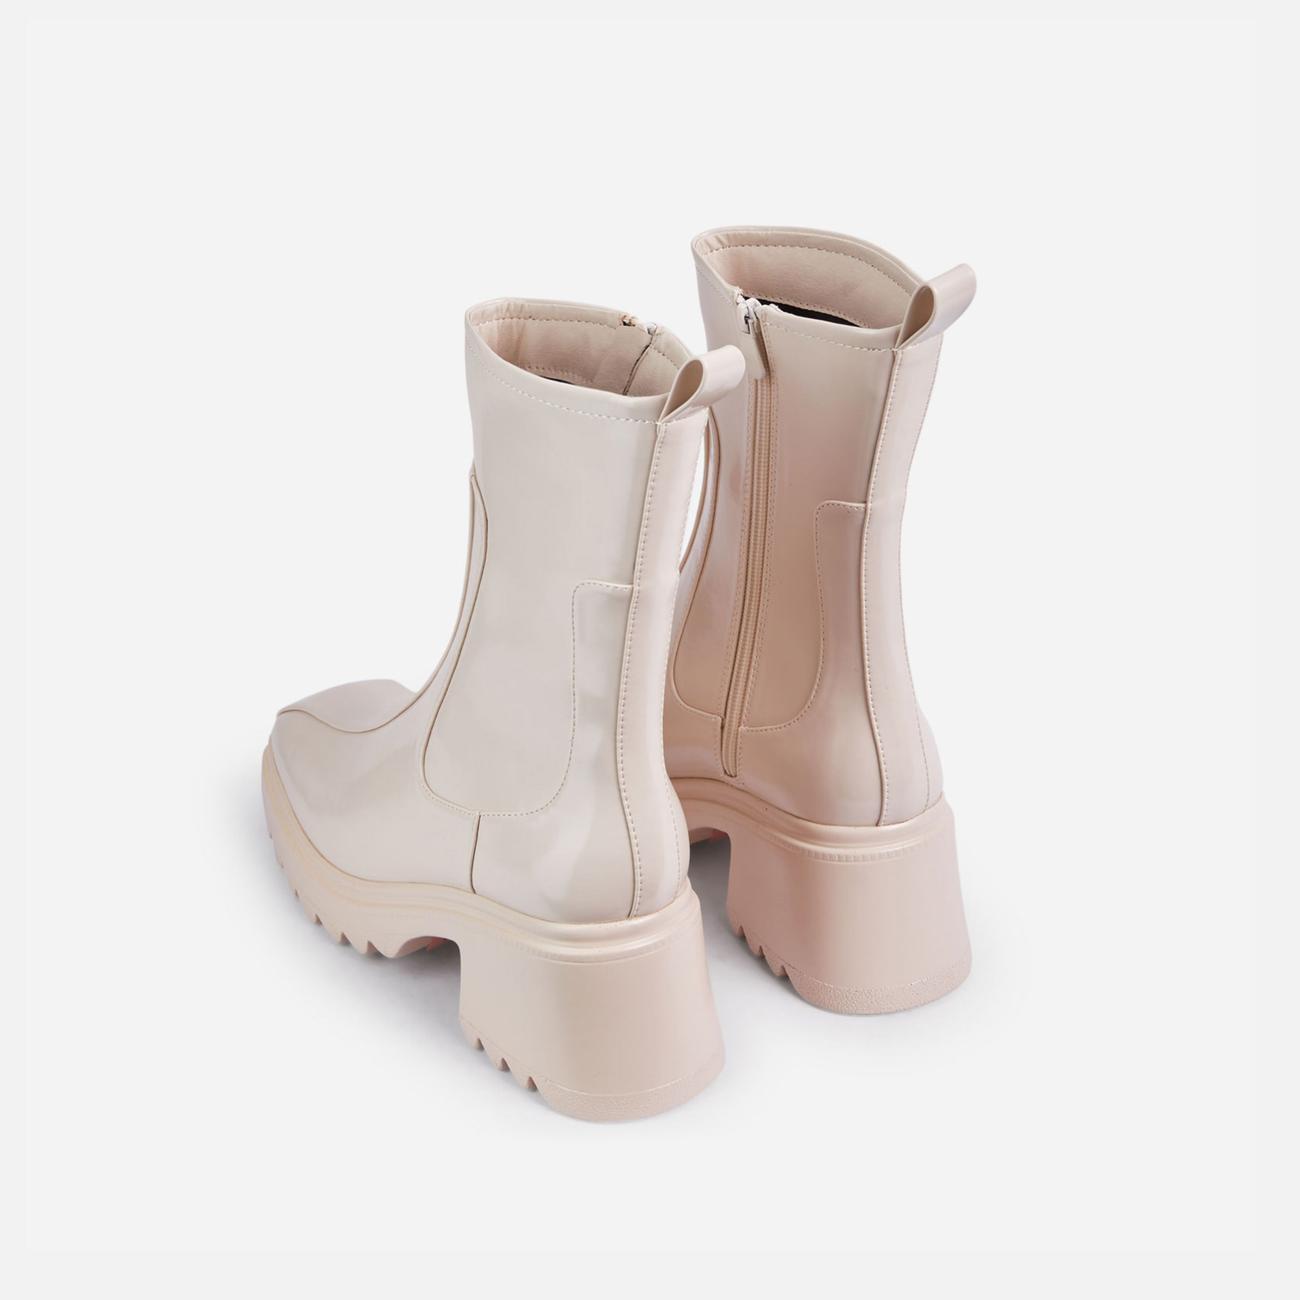 Rain-On-Me Block Heel Ankle Wellington Boot In Cream Image 3